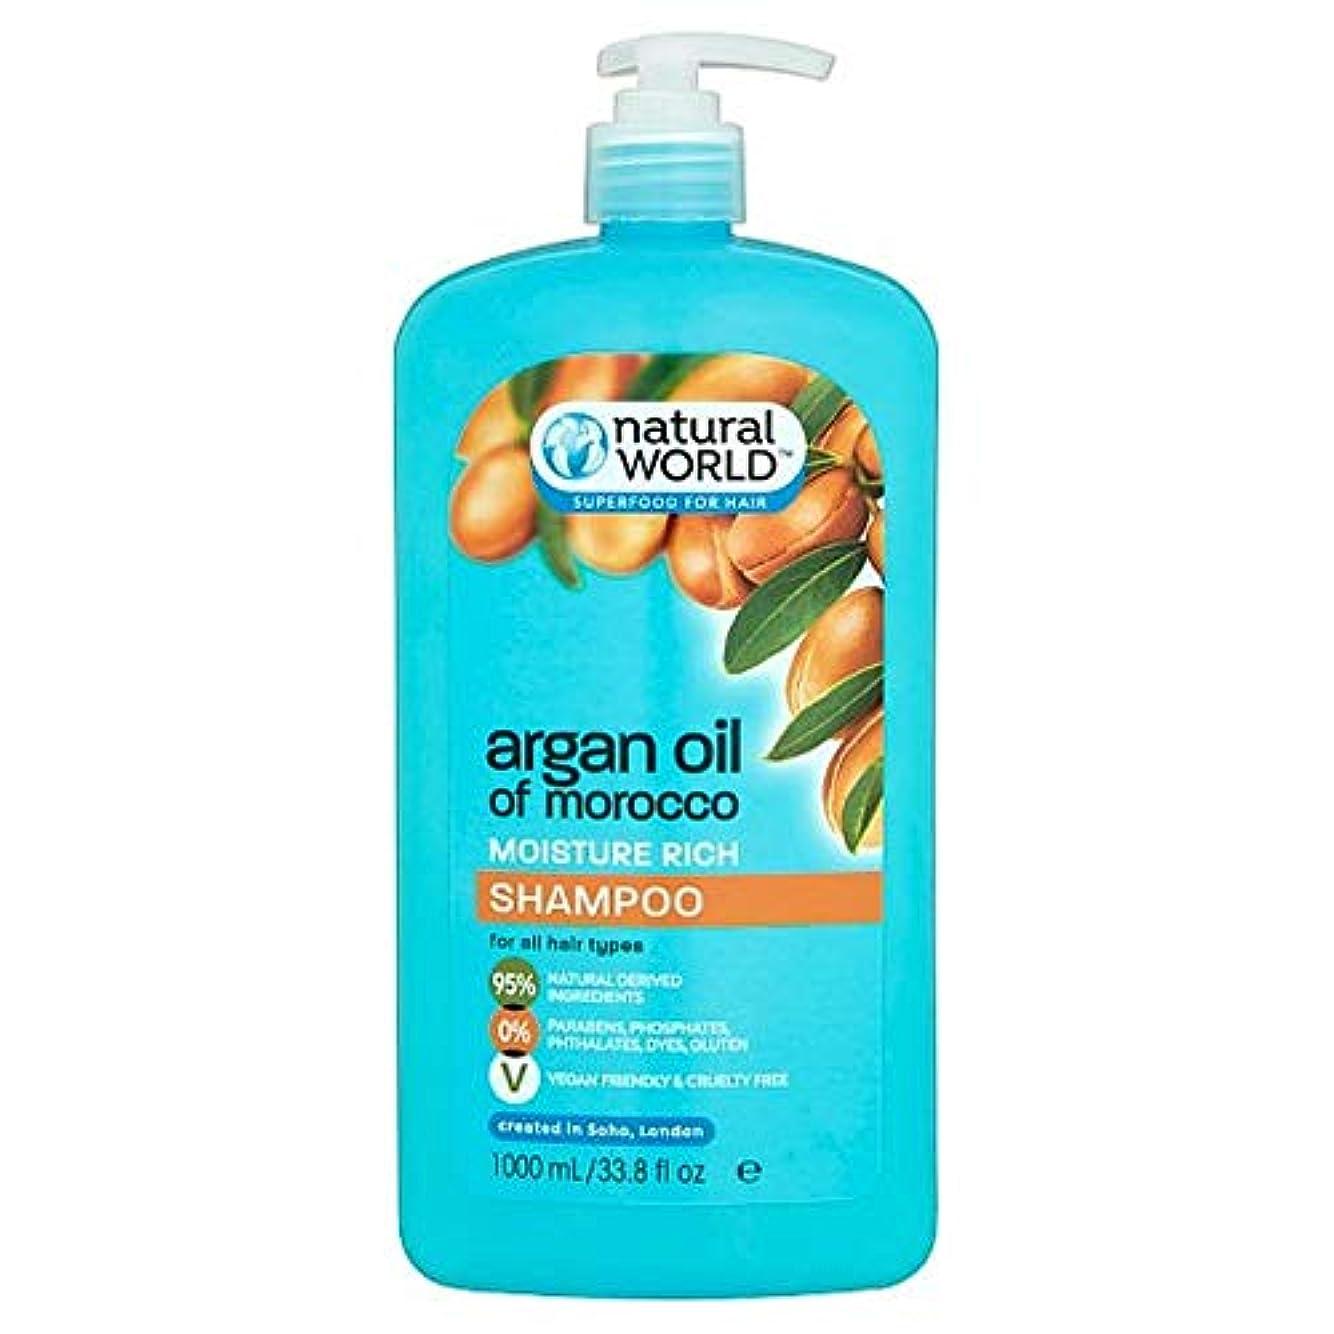 [Natural World ] 自然界アルガンオイルシャンプー千ミリリットル - Natural World Argan Oil Shampoo 1000Ml [並行輸入品]